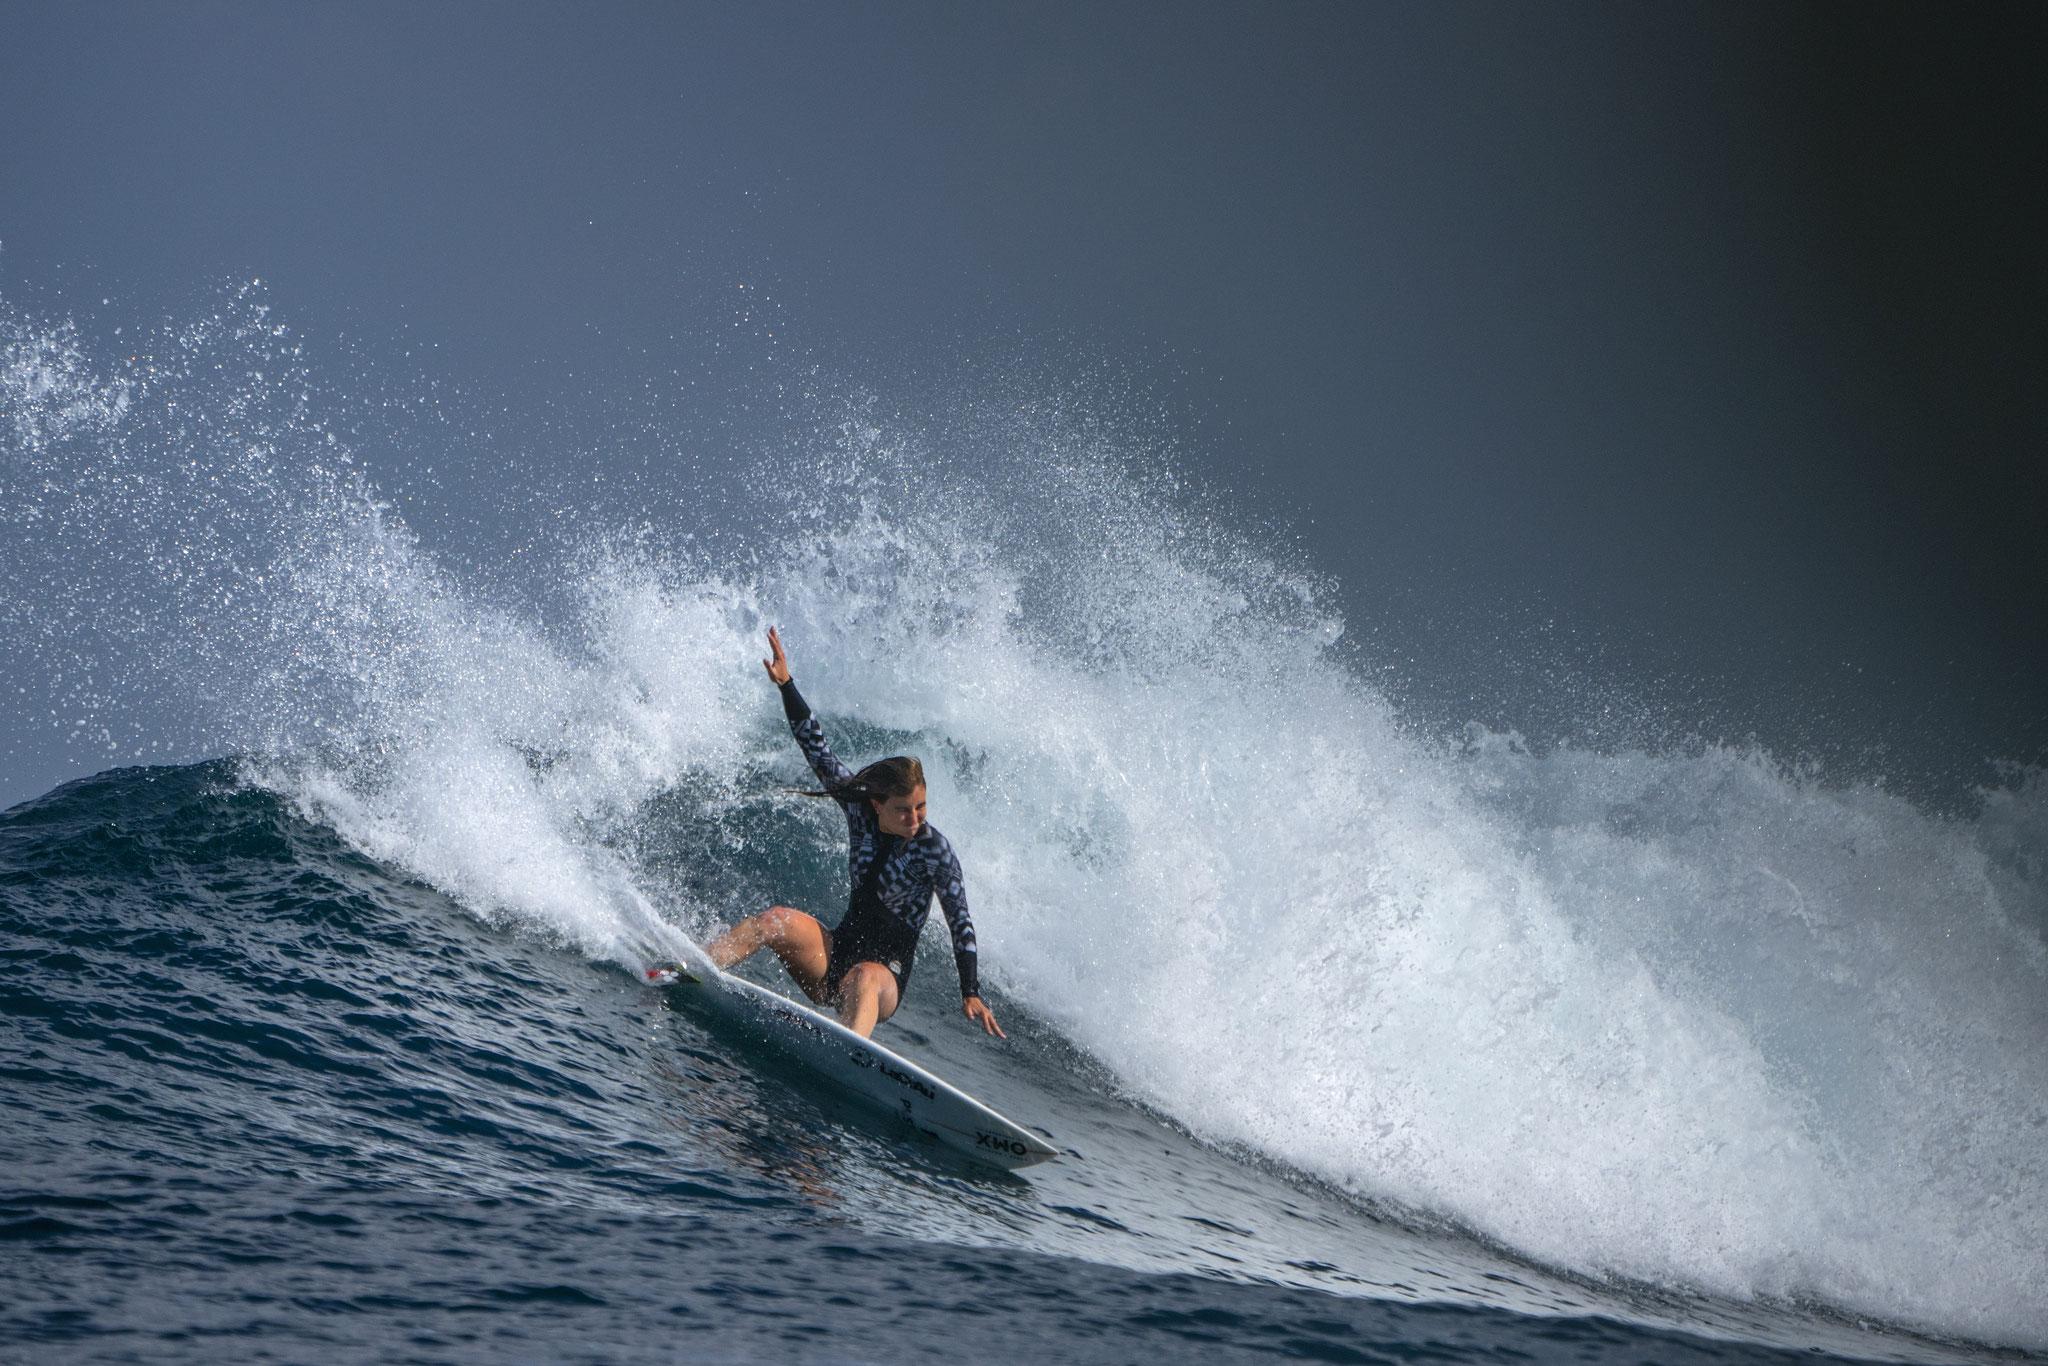 Leonor Fragoso pro surfer girl ripping in Madagascar